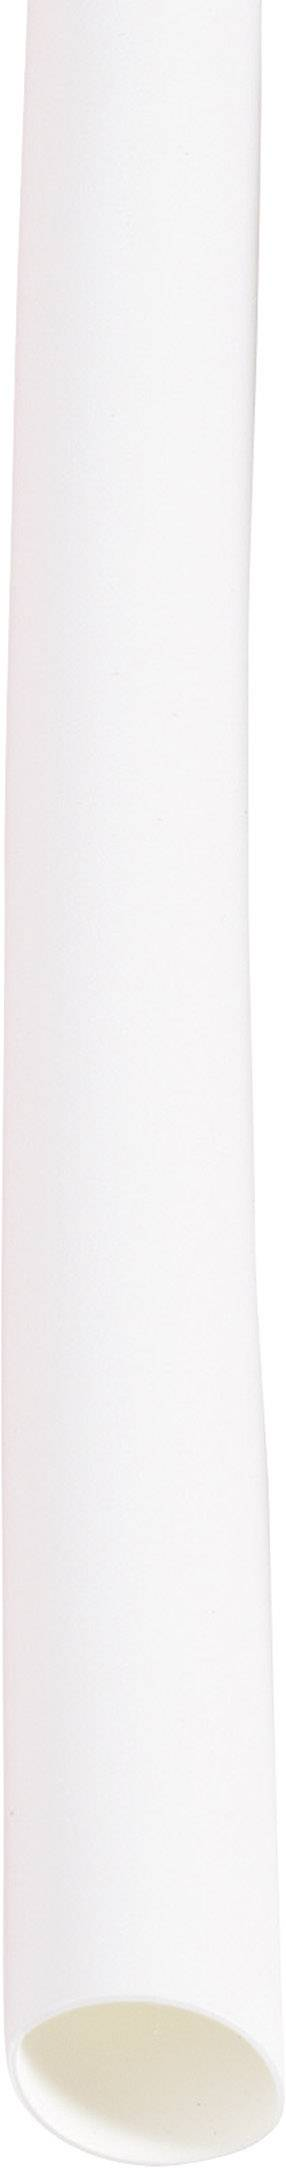 Smršťovací bužírka bez lepidla DSG Canusa 2890127902 2:1, -55 až +135 °C, 12.70 mm, bílá, metrové zboží